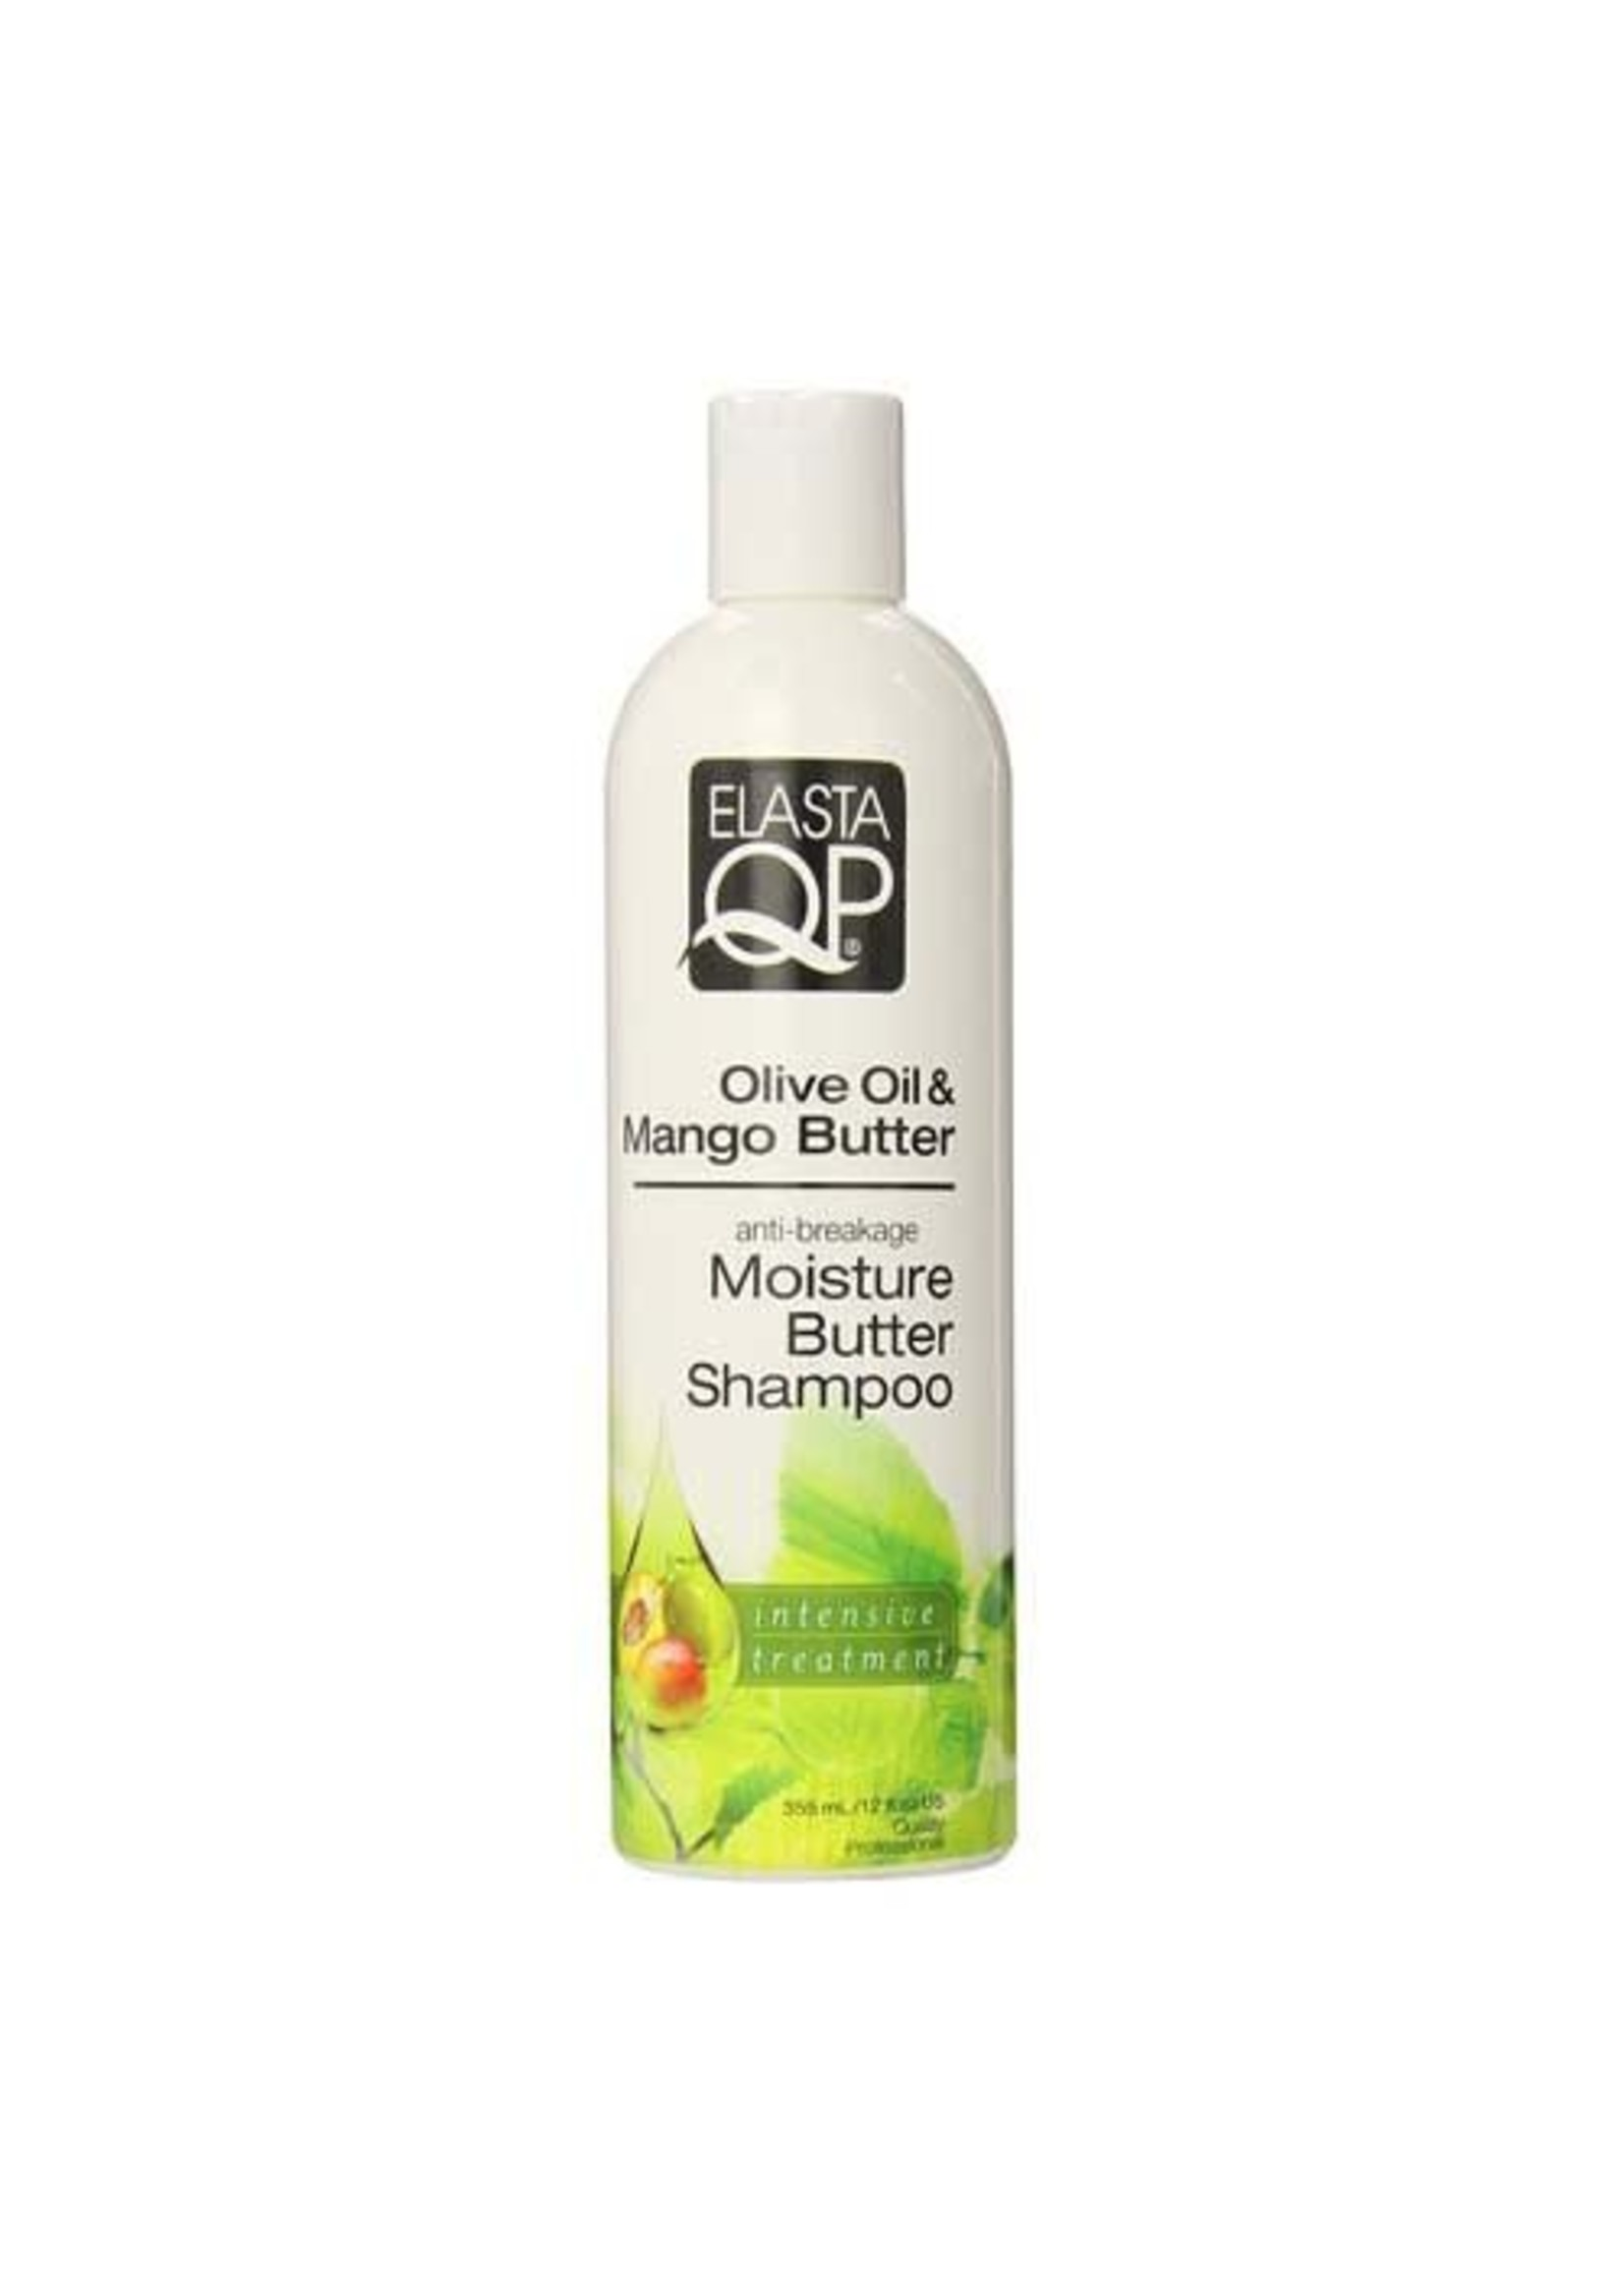 Elasta QP Olive Oil & Mango Butter 12oz